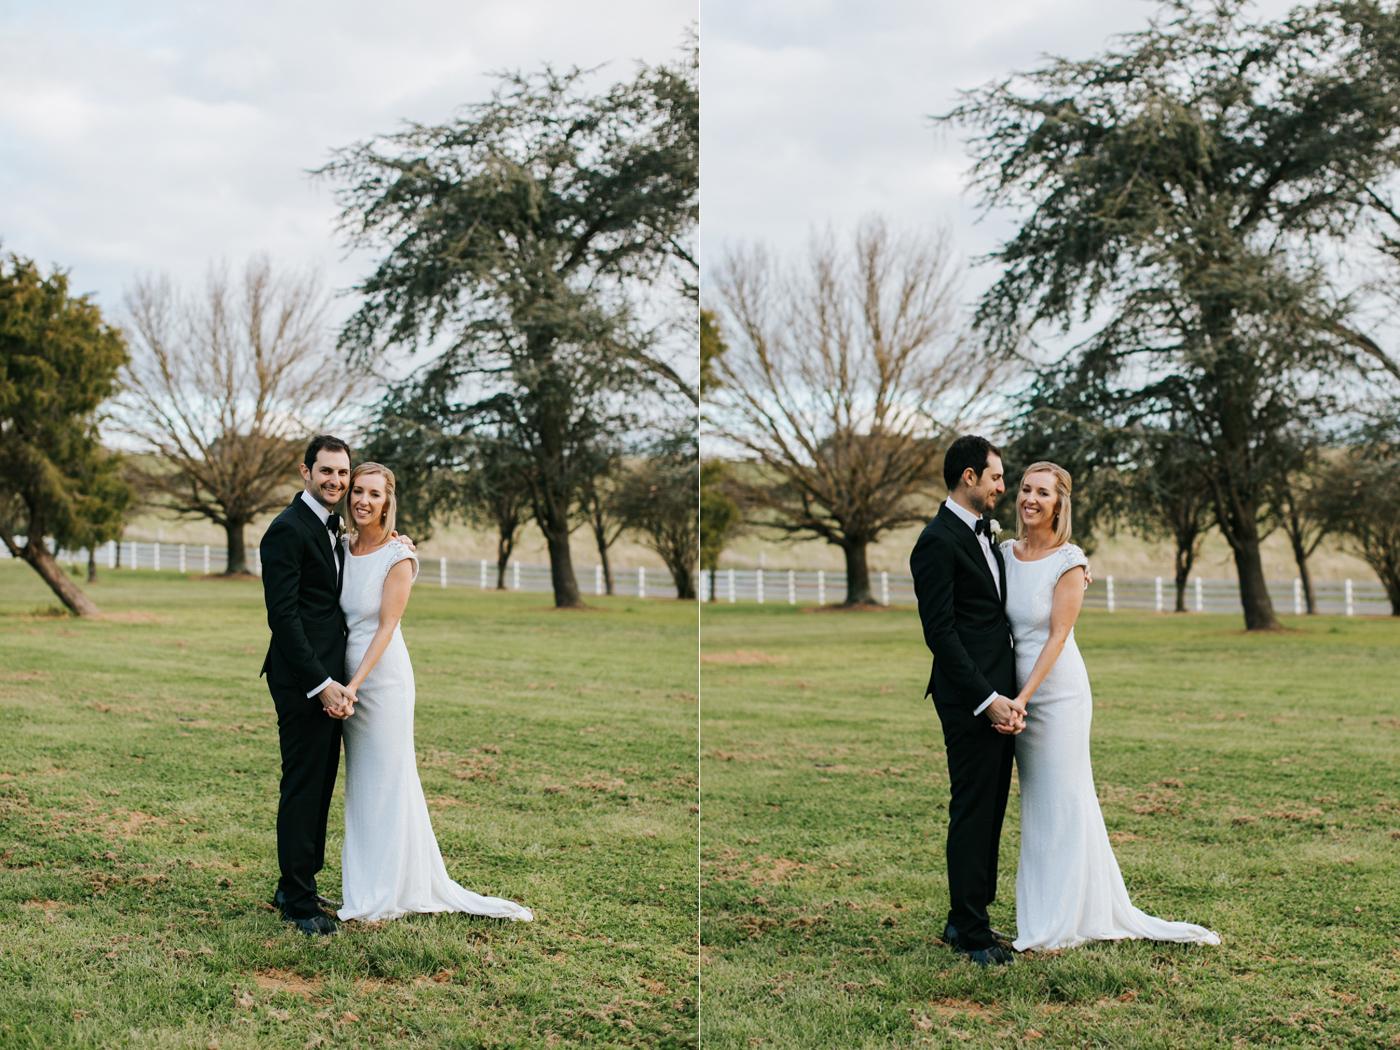 Bridget & James - Orange Country Wedding - Samantha Heather Photography-157.jpg